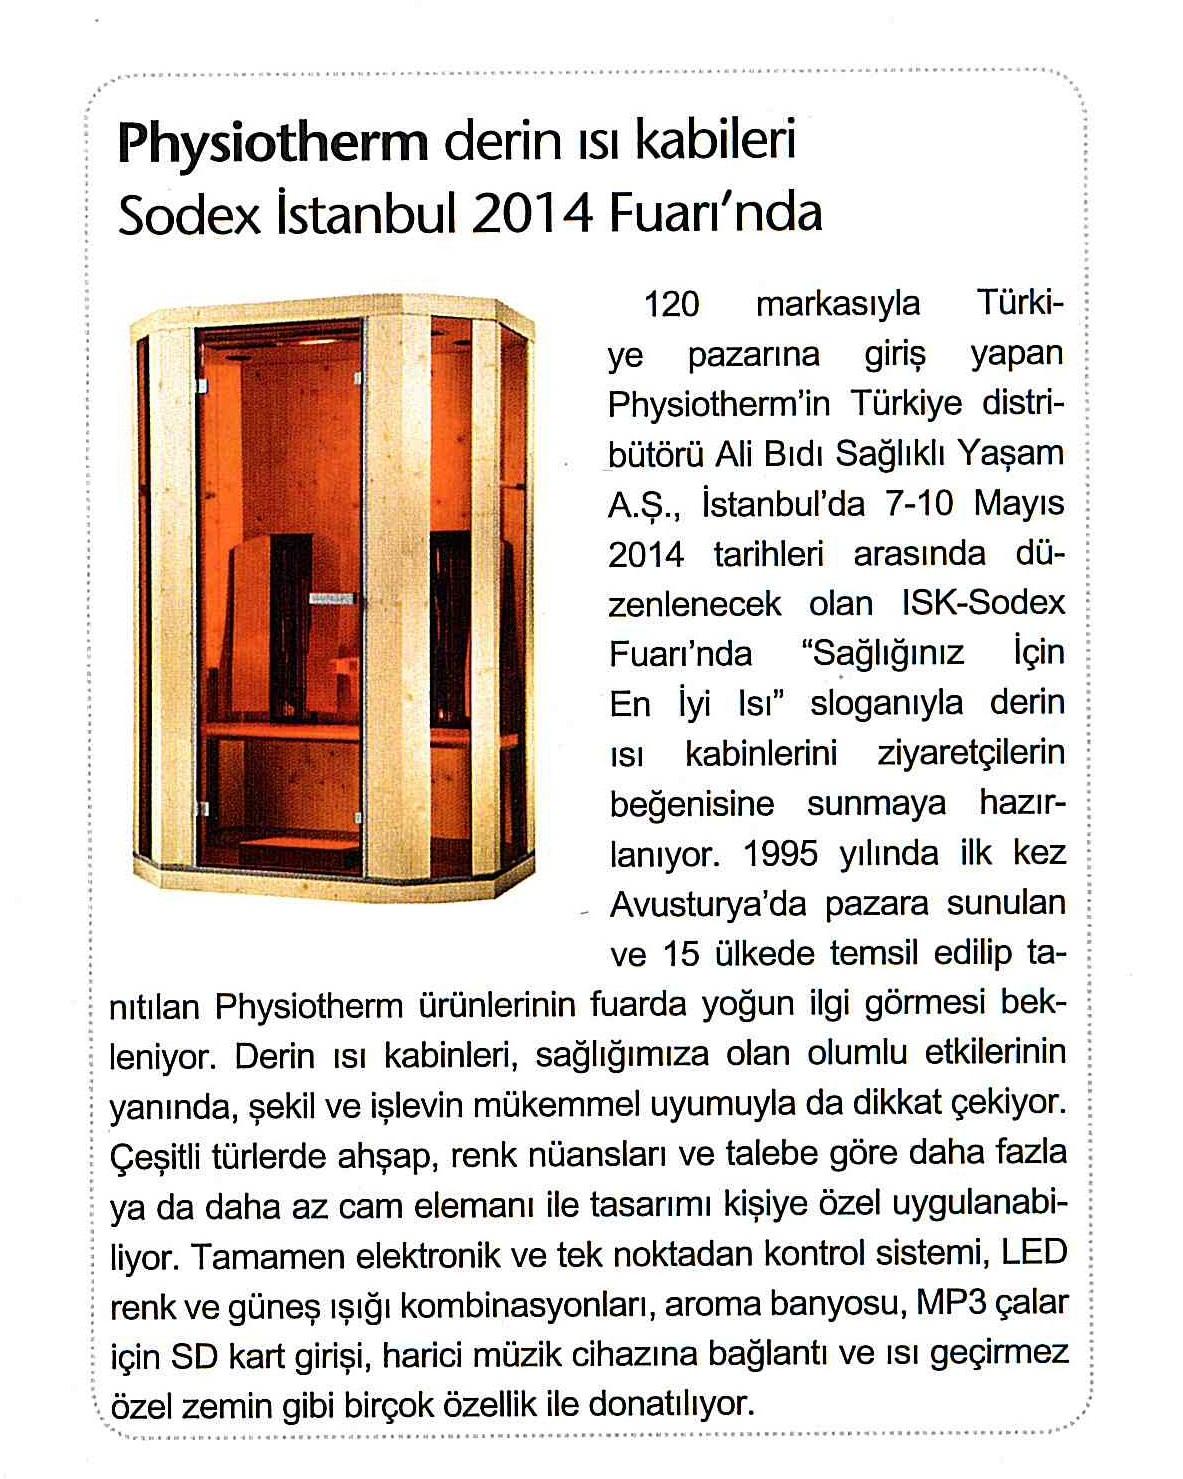 insaat ve yatirim dergisi mayis 2014-118.sayi